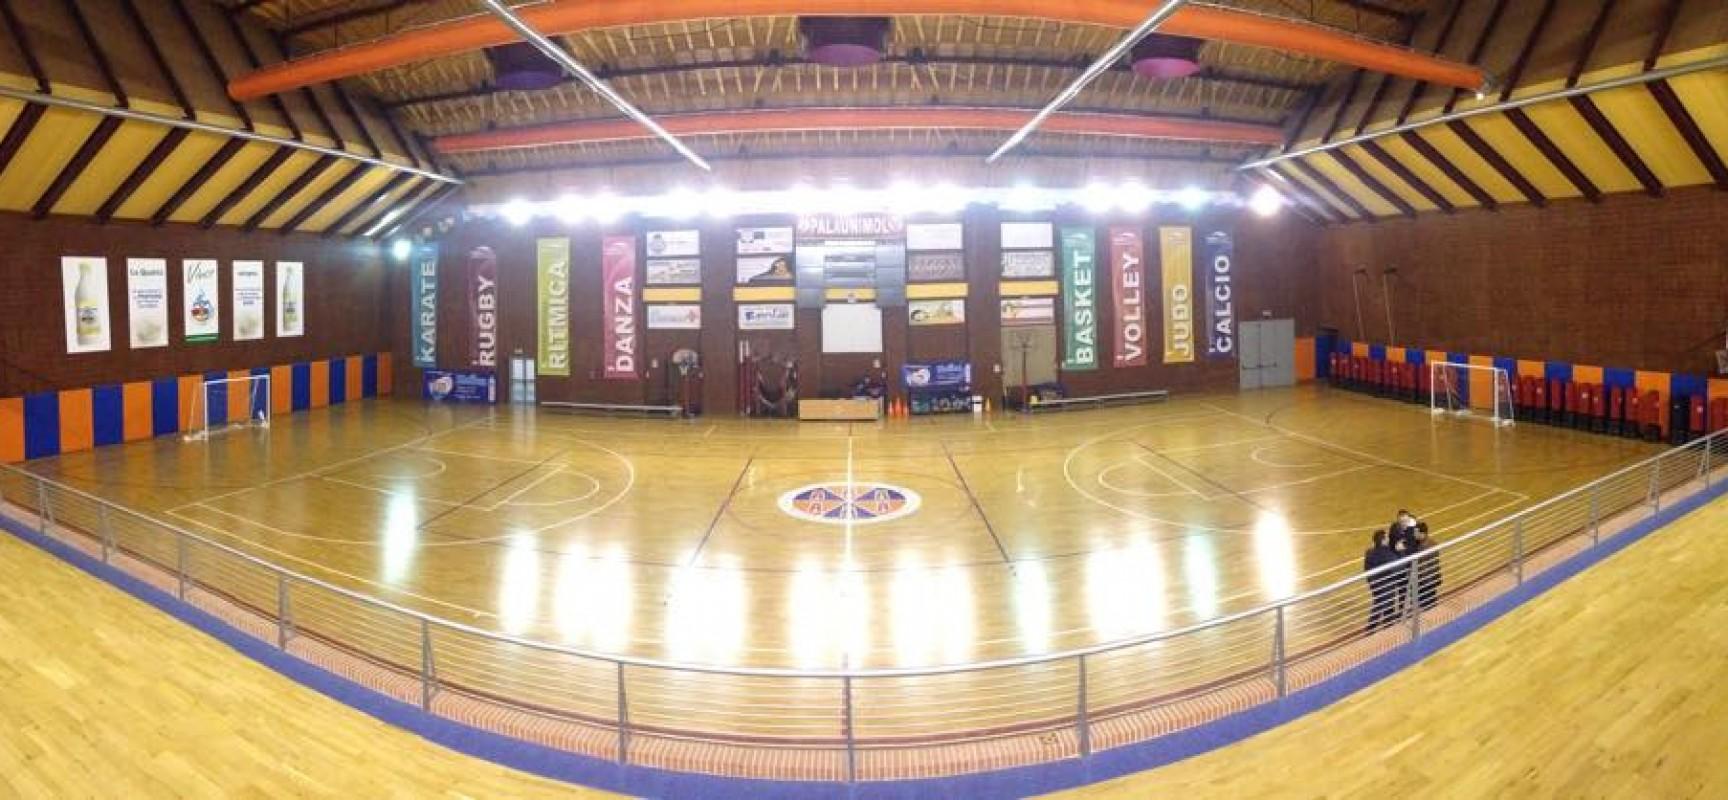 FINALE: Campobasso-Futsal Bisceglie 4-10